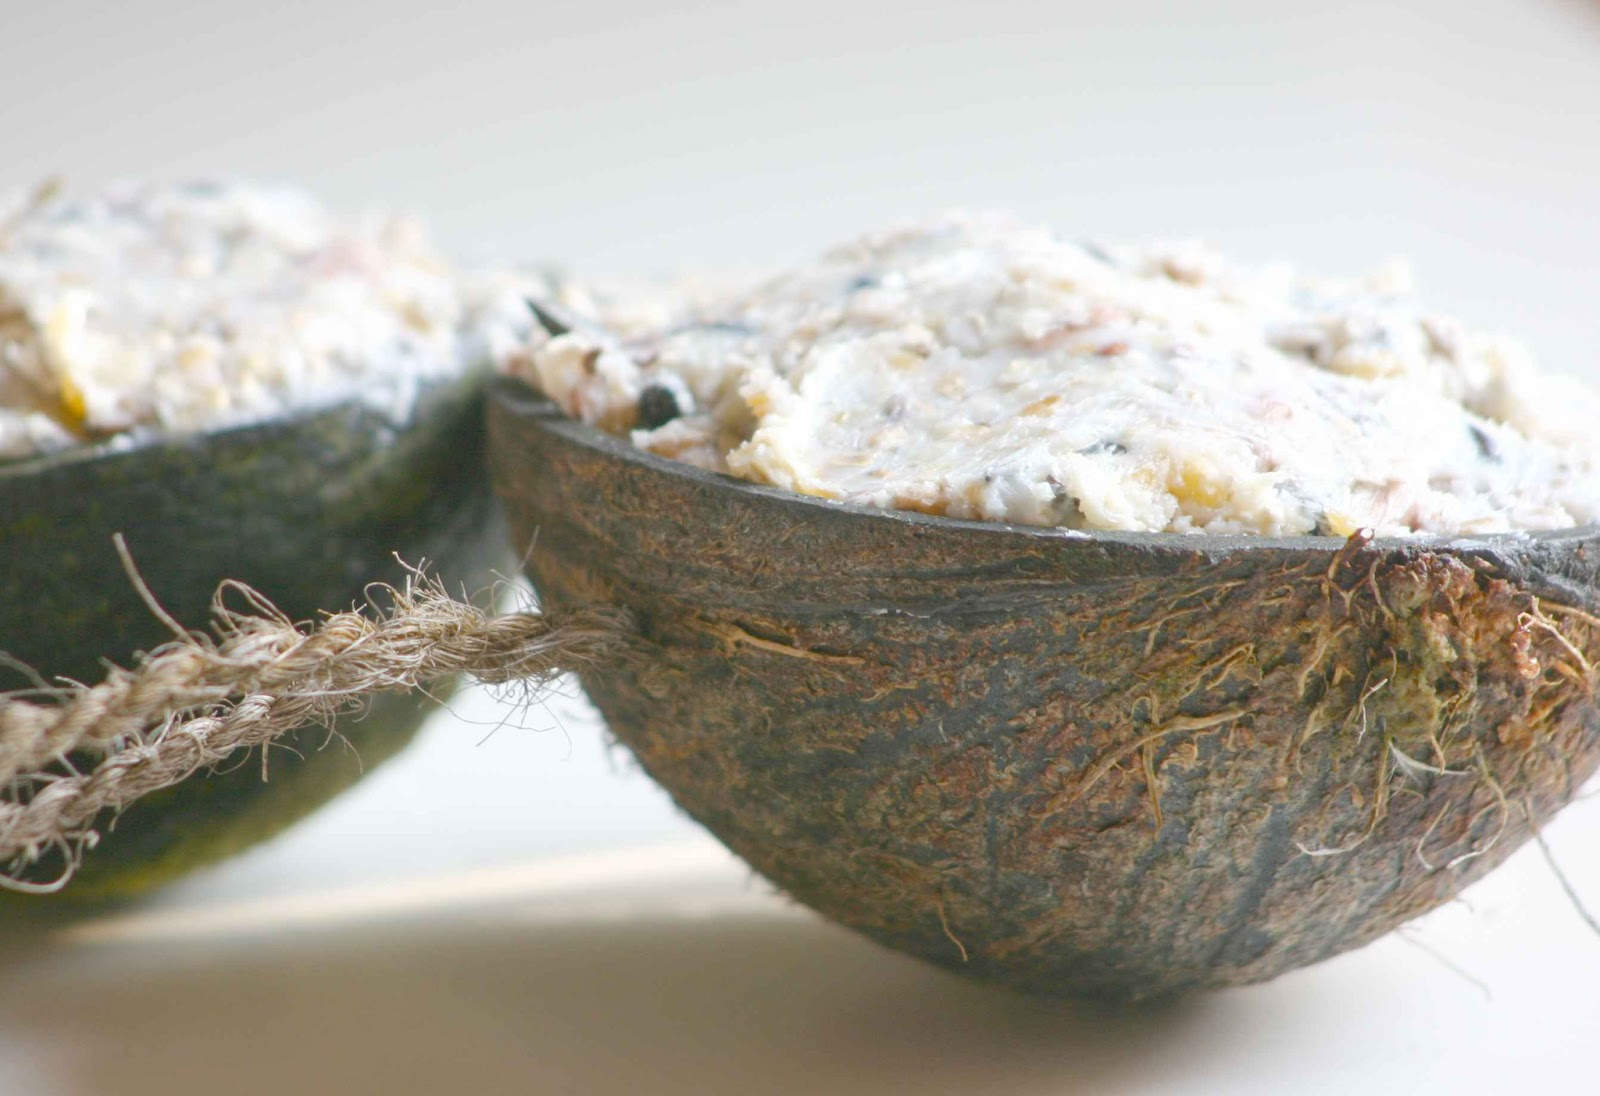 jennifer tetlow stone sculpture journal feeding birds in cold